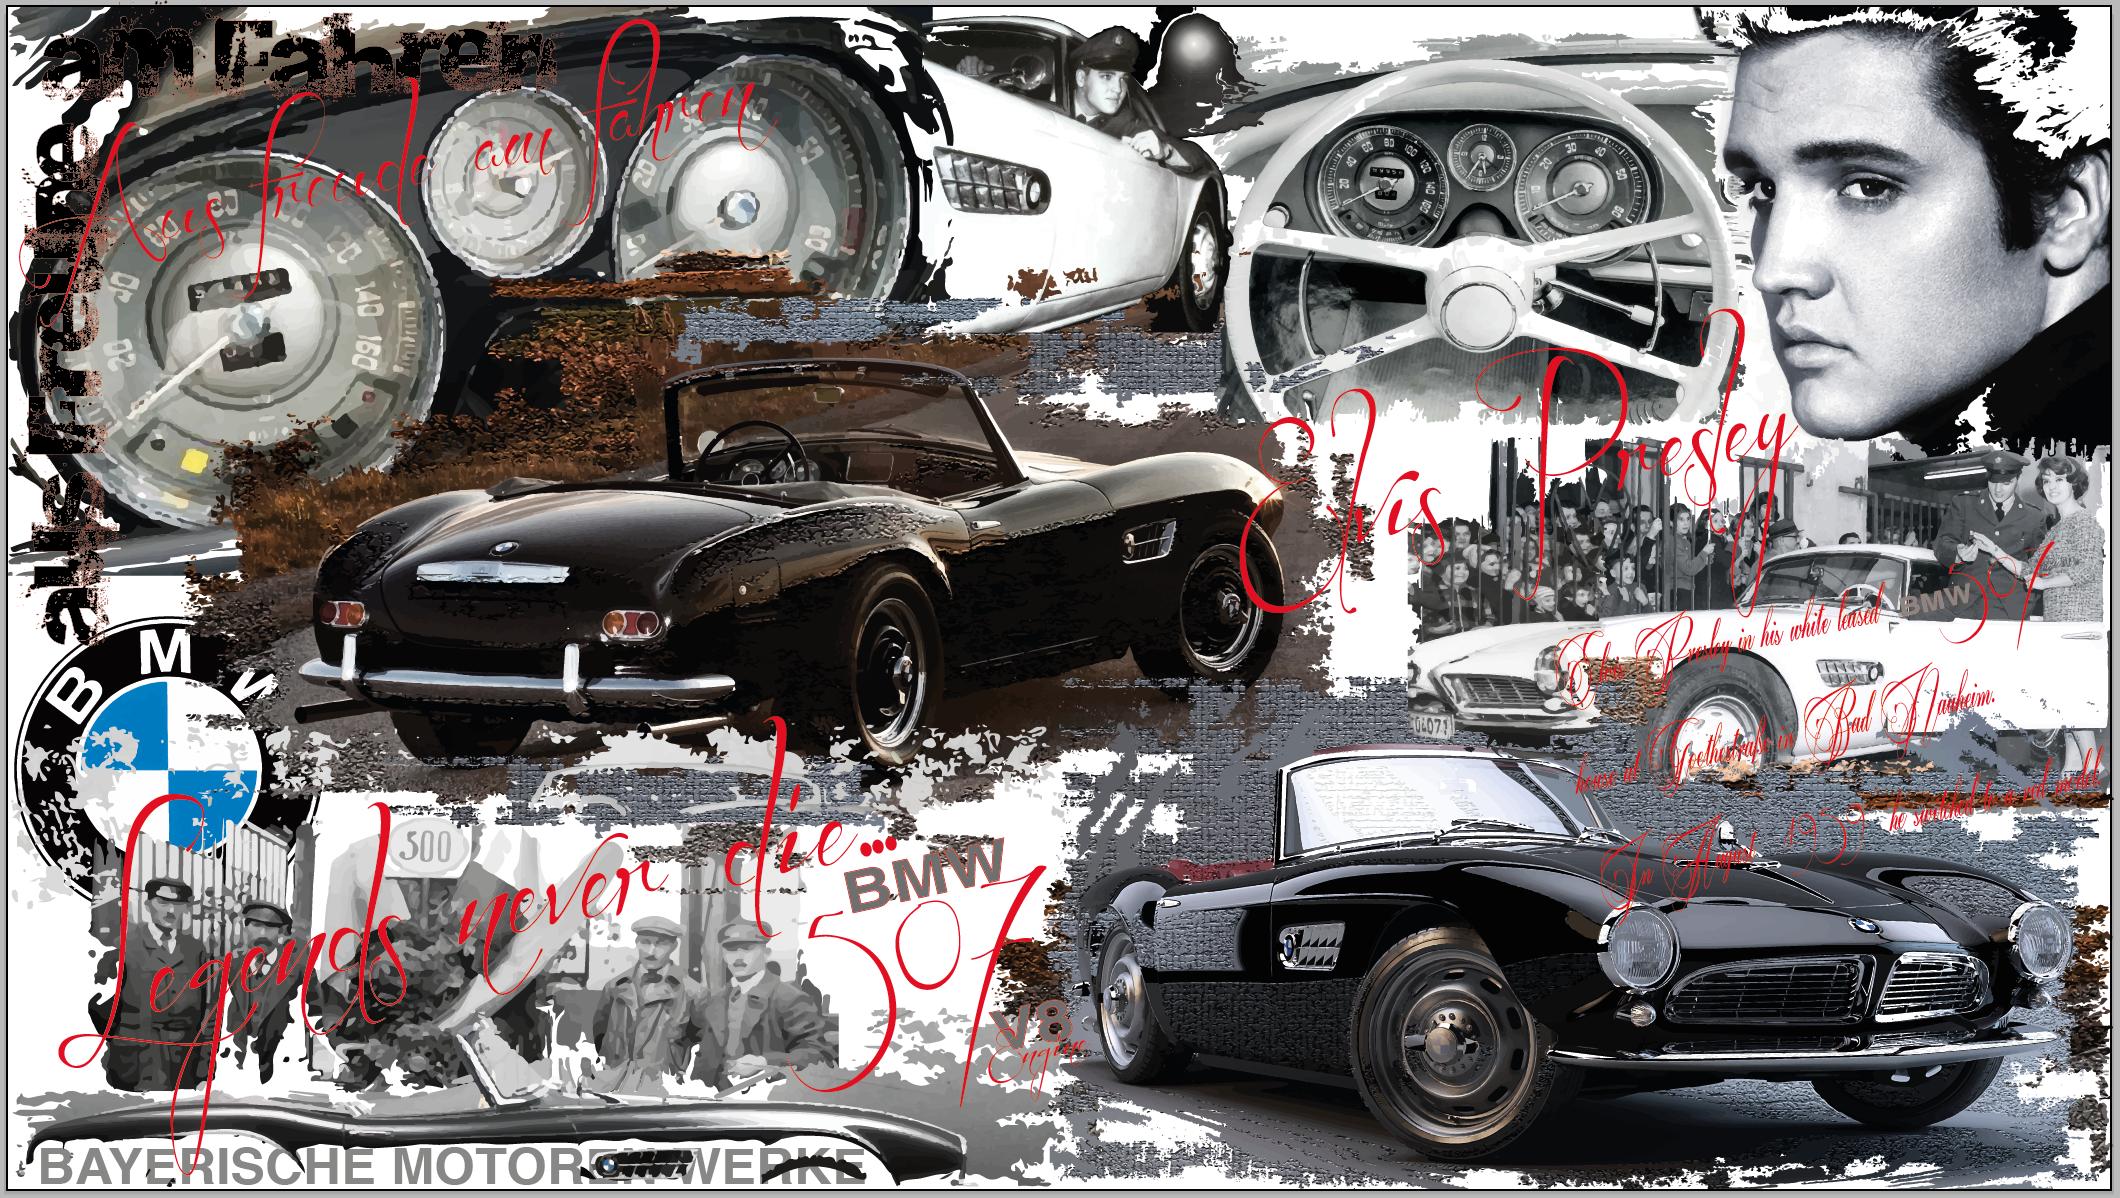 BMW 507 Elvis